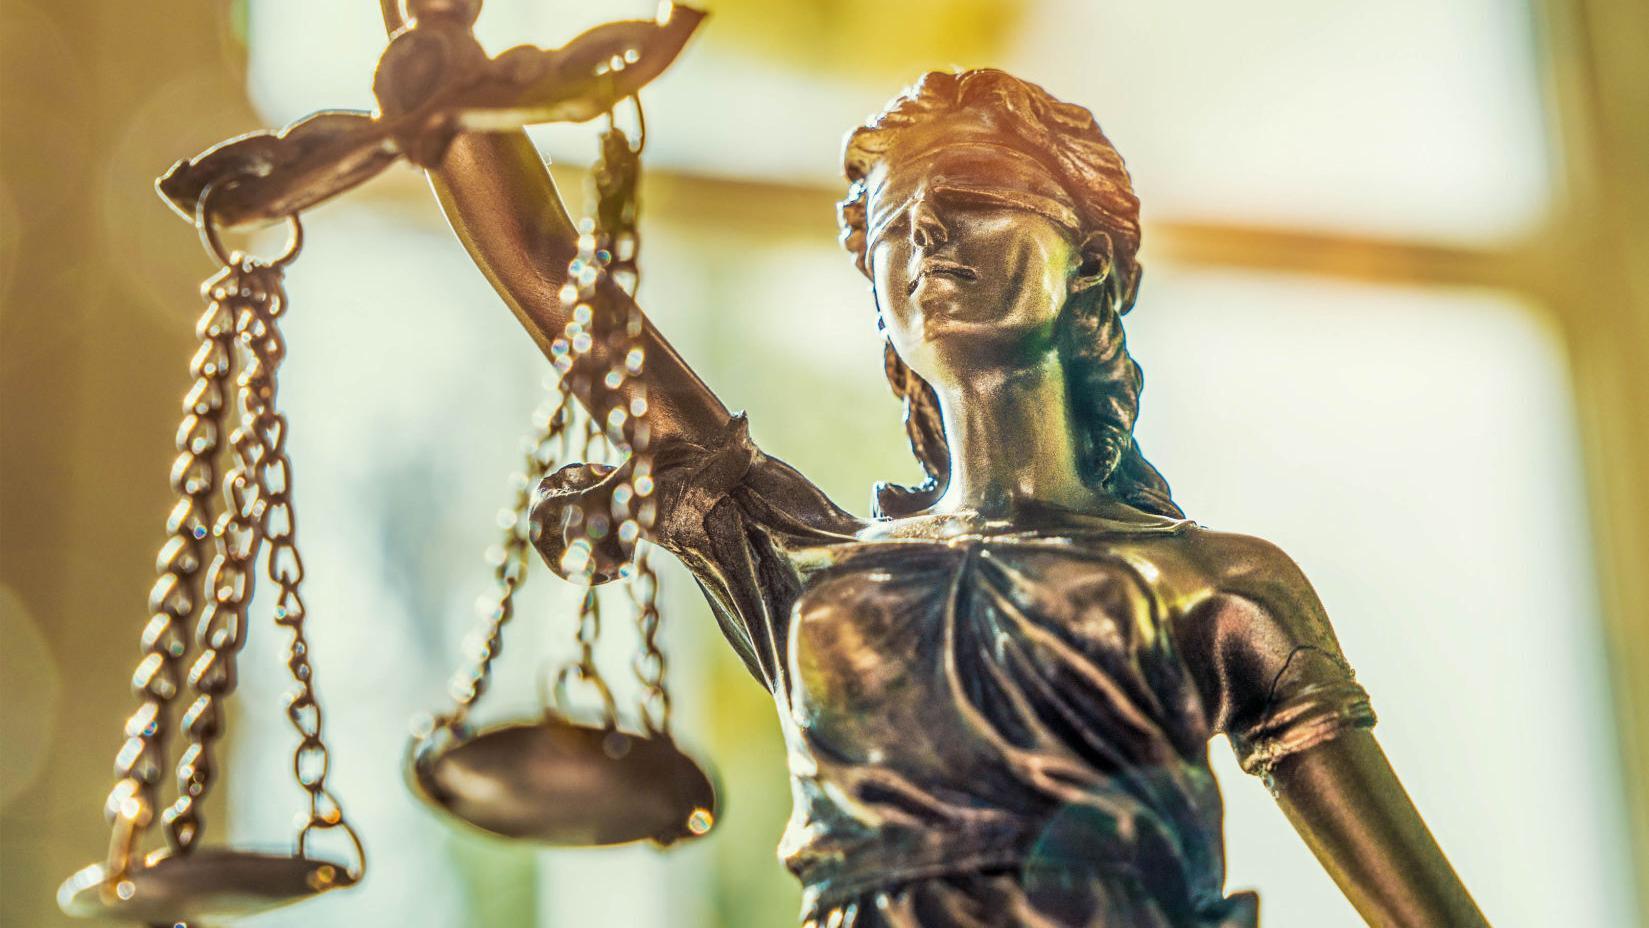 Orange City man accused of price-gouging agrees to stop online sales